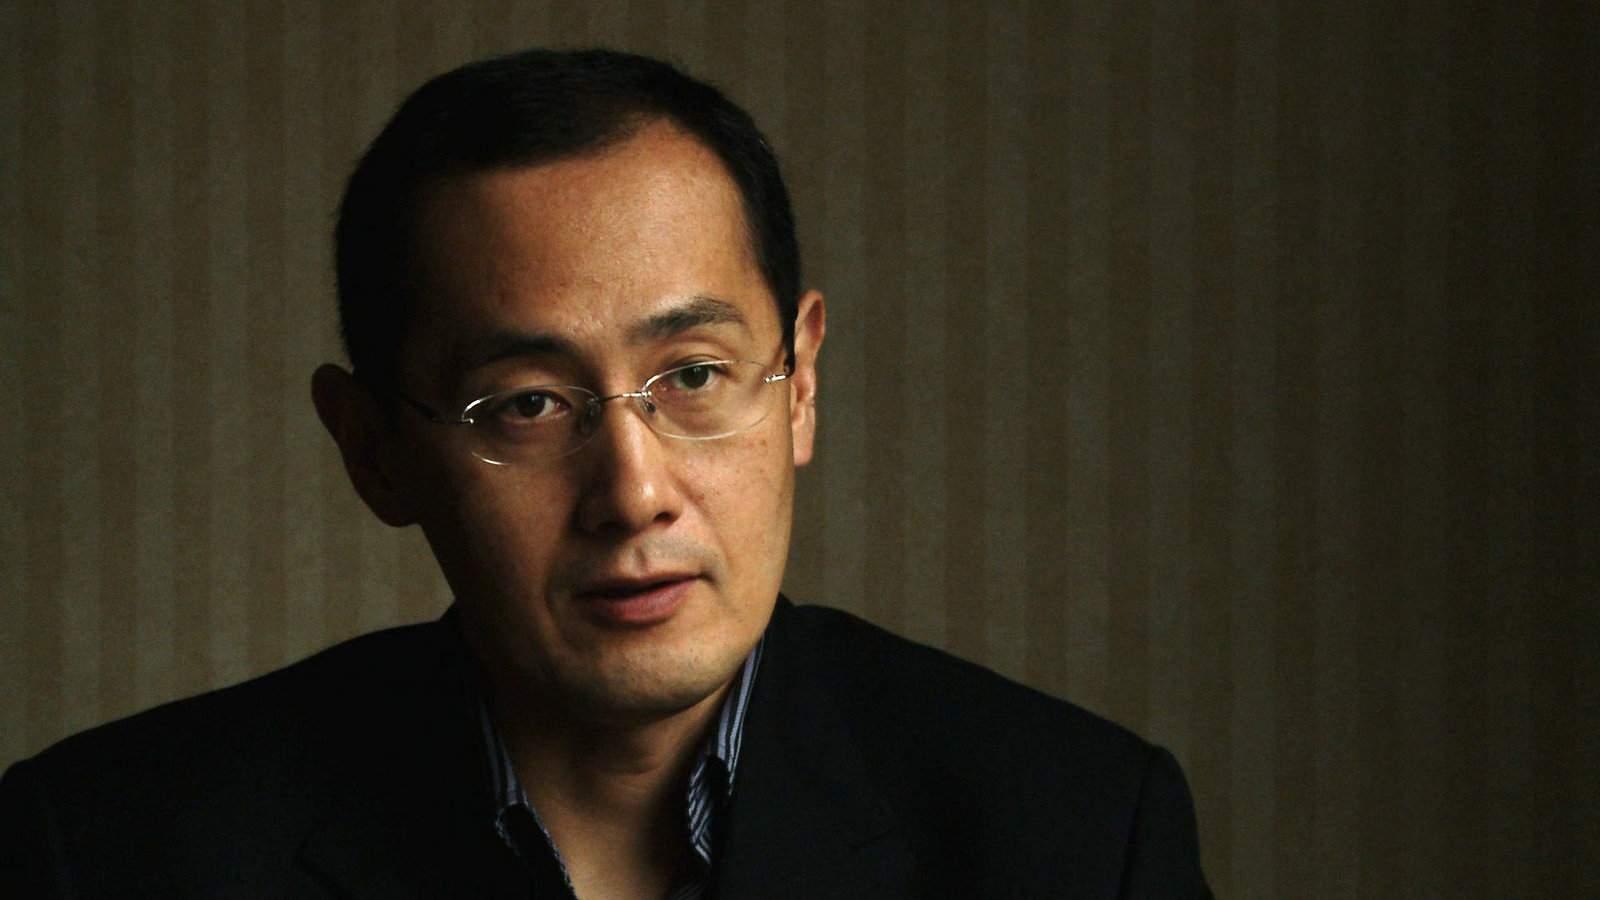 Professor_Shinya_Yamanaka_2.jpg